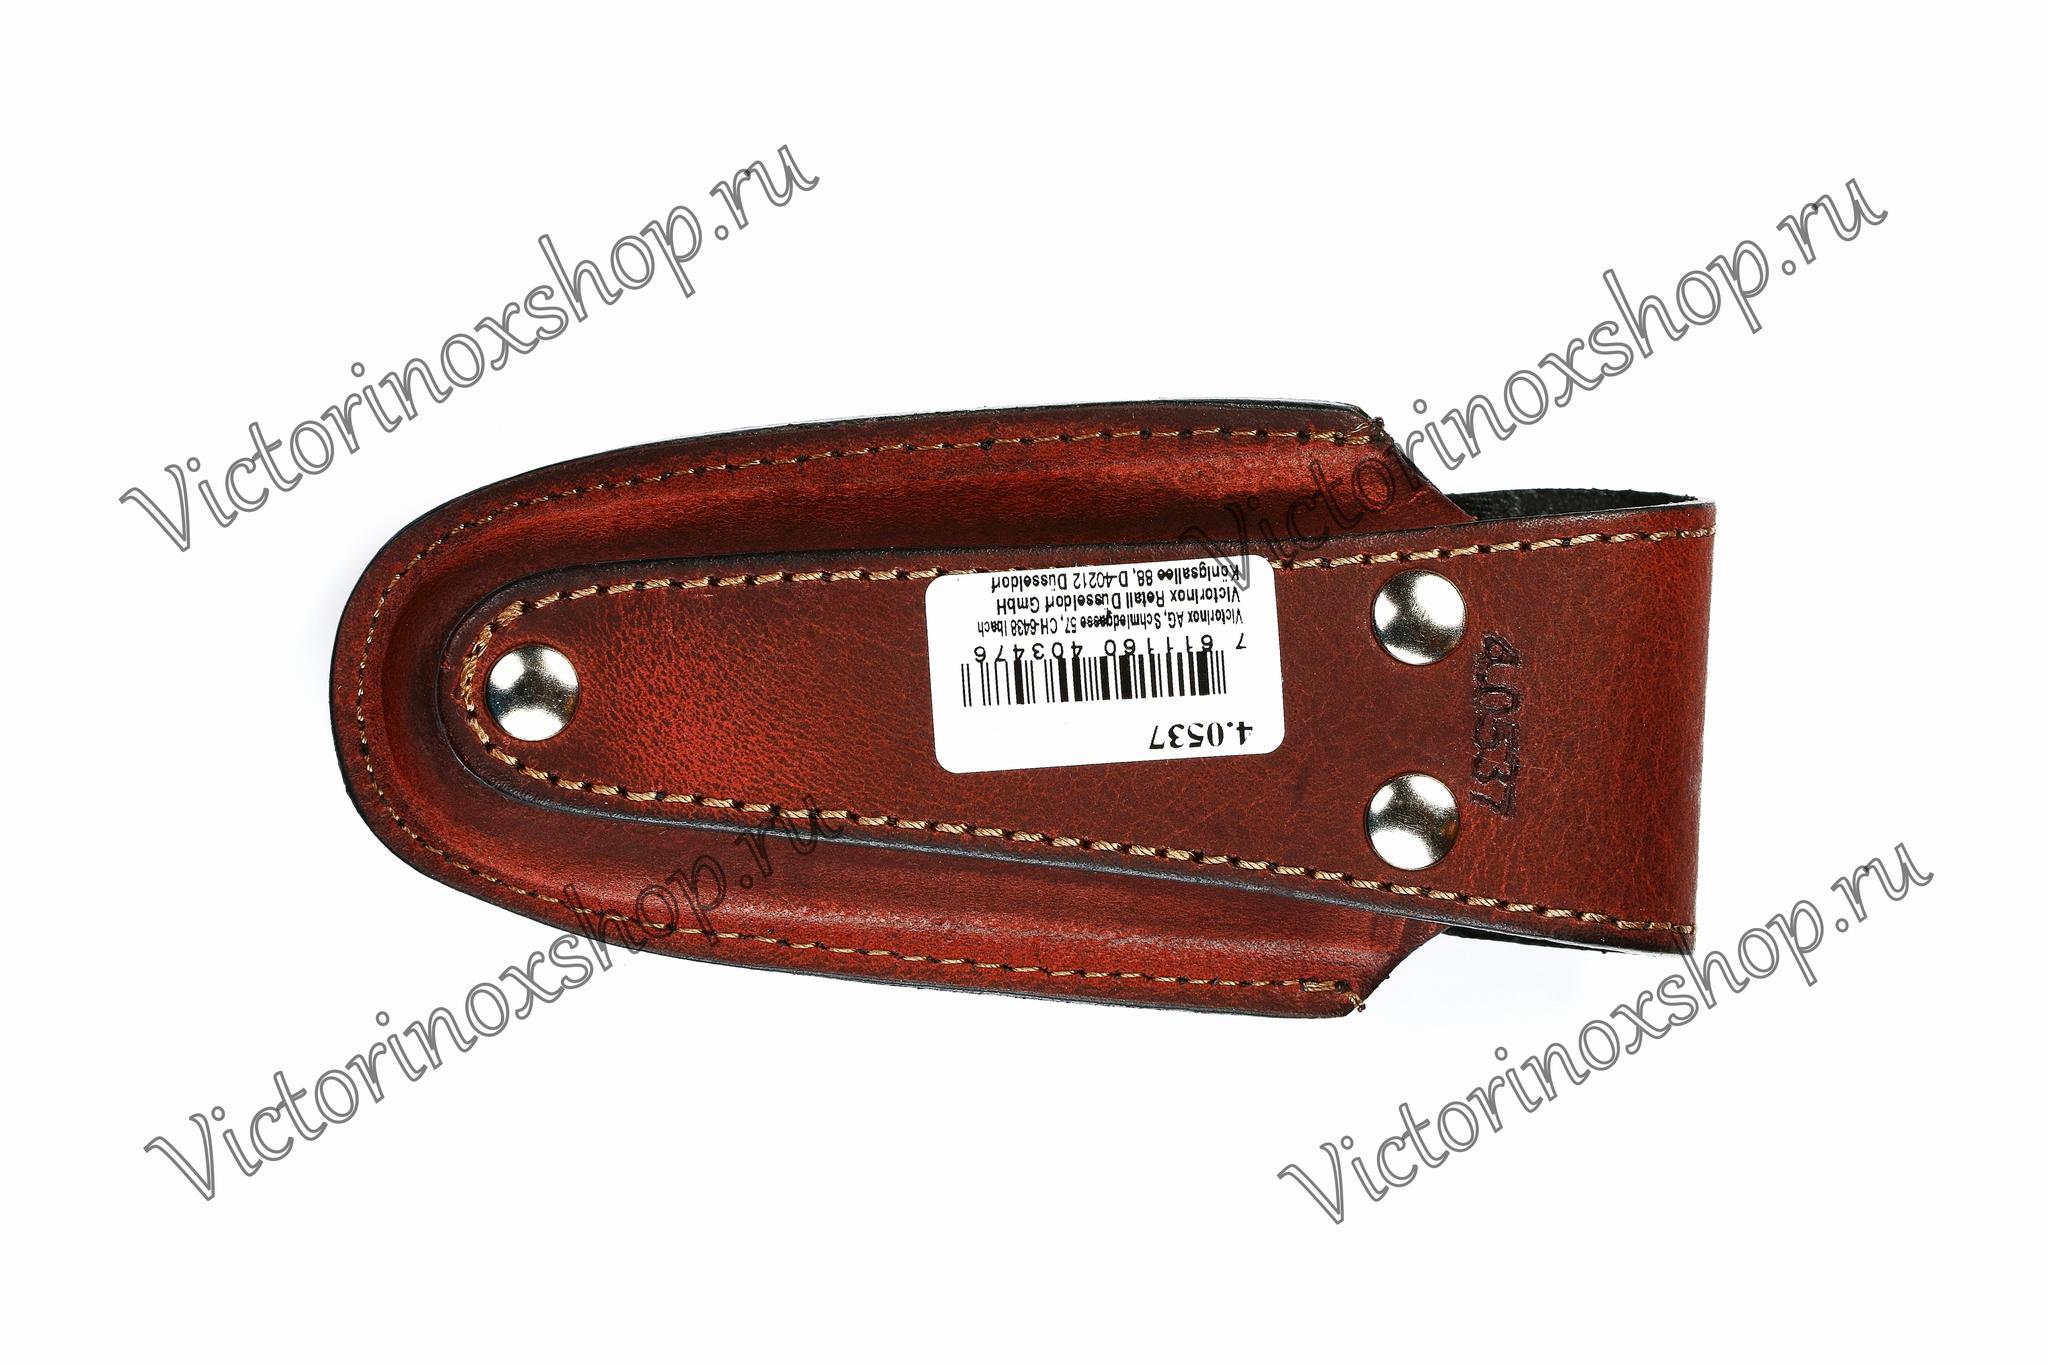 Чехол для ножей Victorinox 111 мм. кожаный (4.0537)